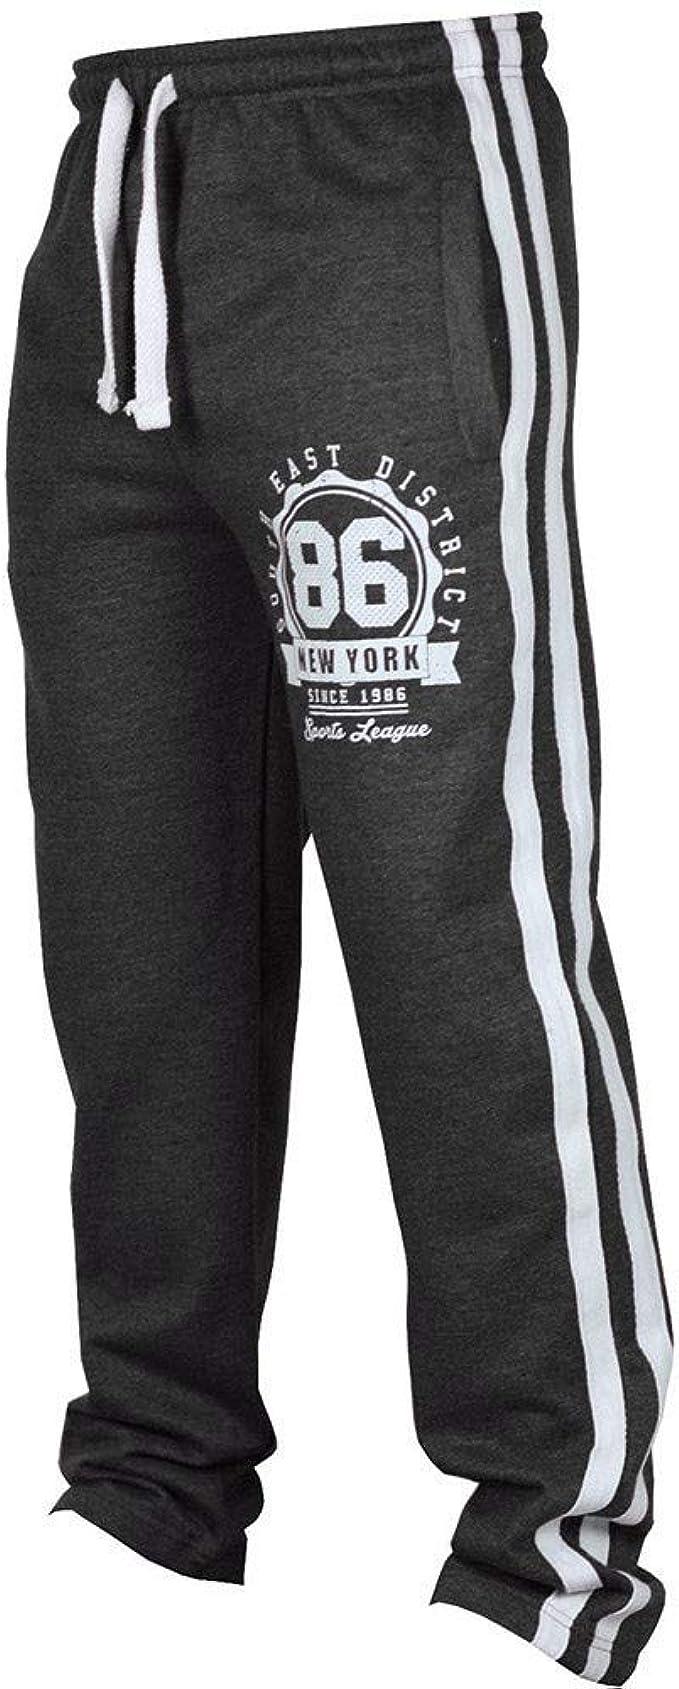 Men Drawstring Pants Dance Jogging Sportwear Sweatpants Casual Wide Leg Trousers